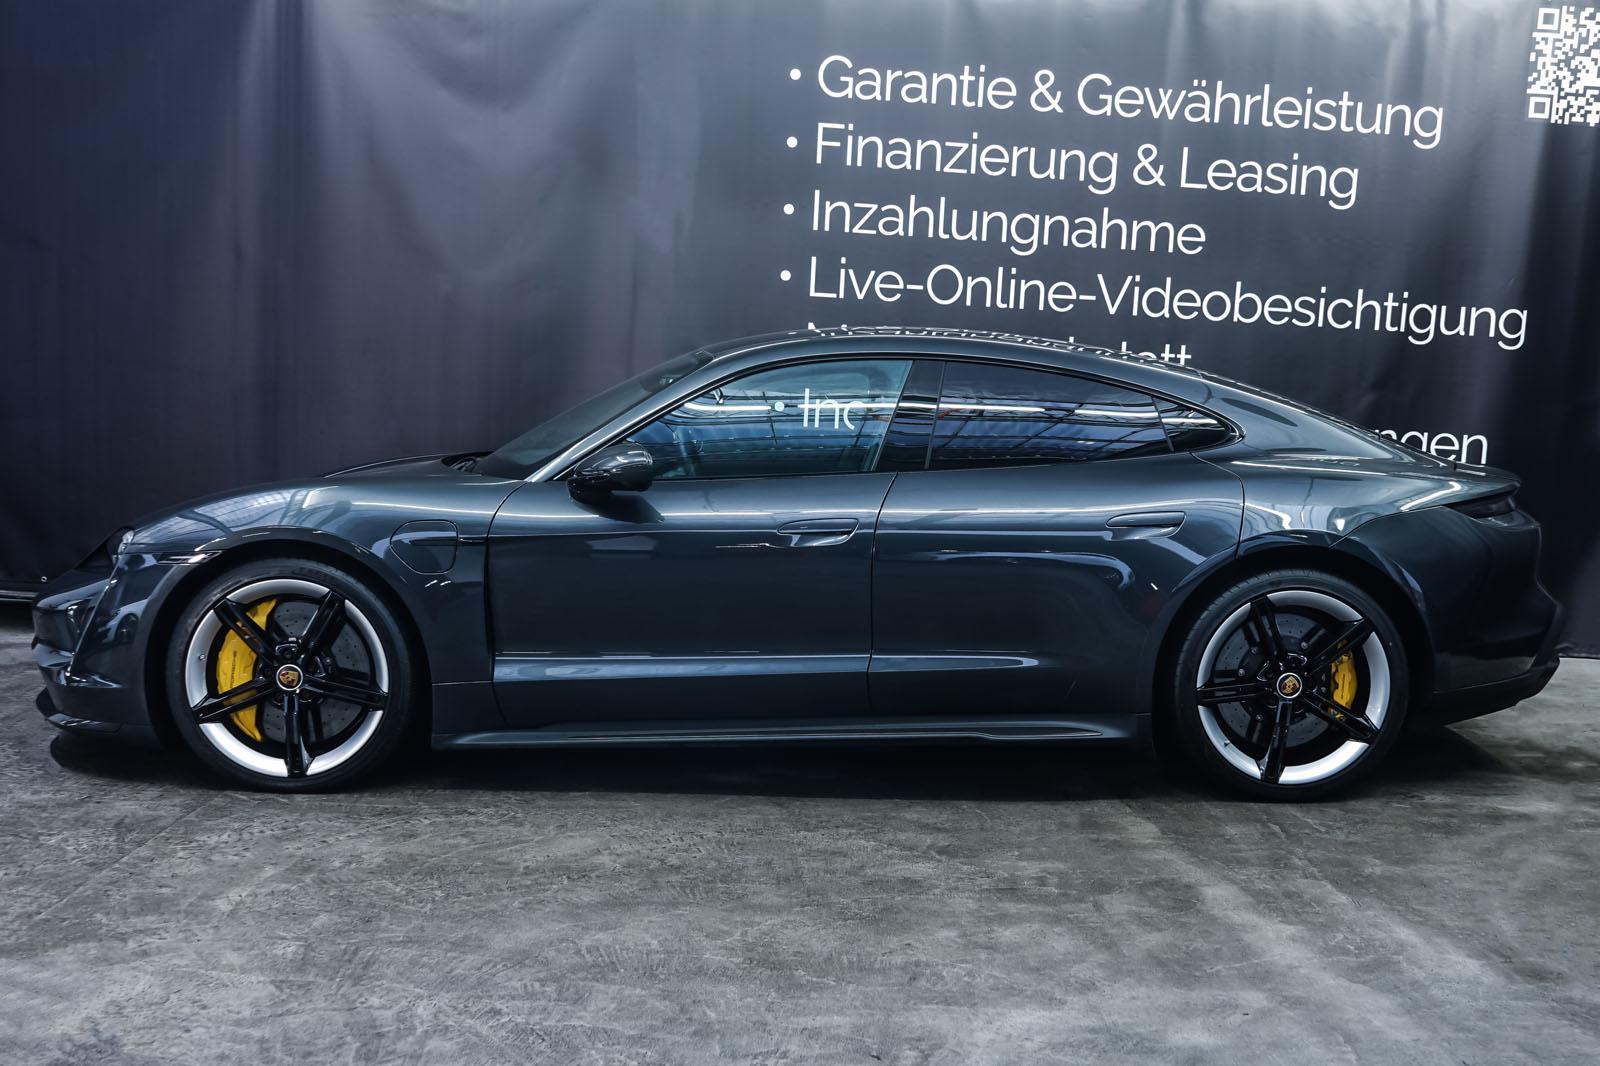 Porsche_Taycan_TurboS_Grau_Schwarz_POR-5353_5_w